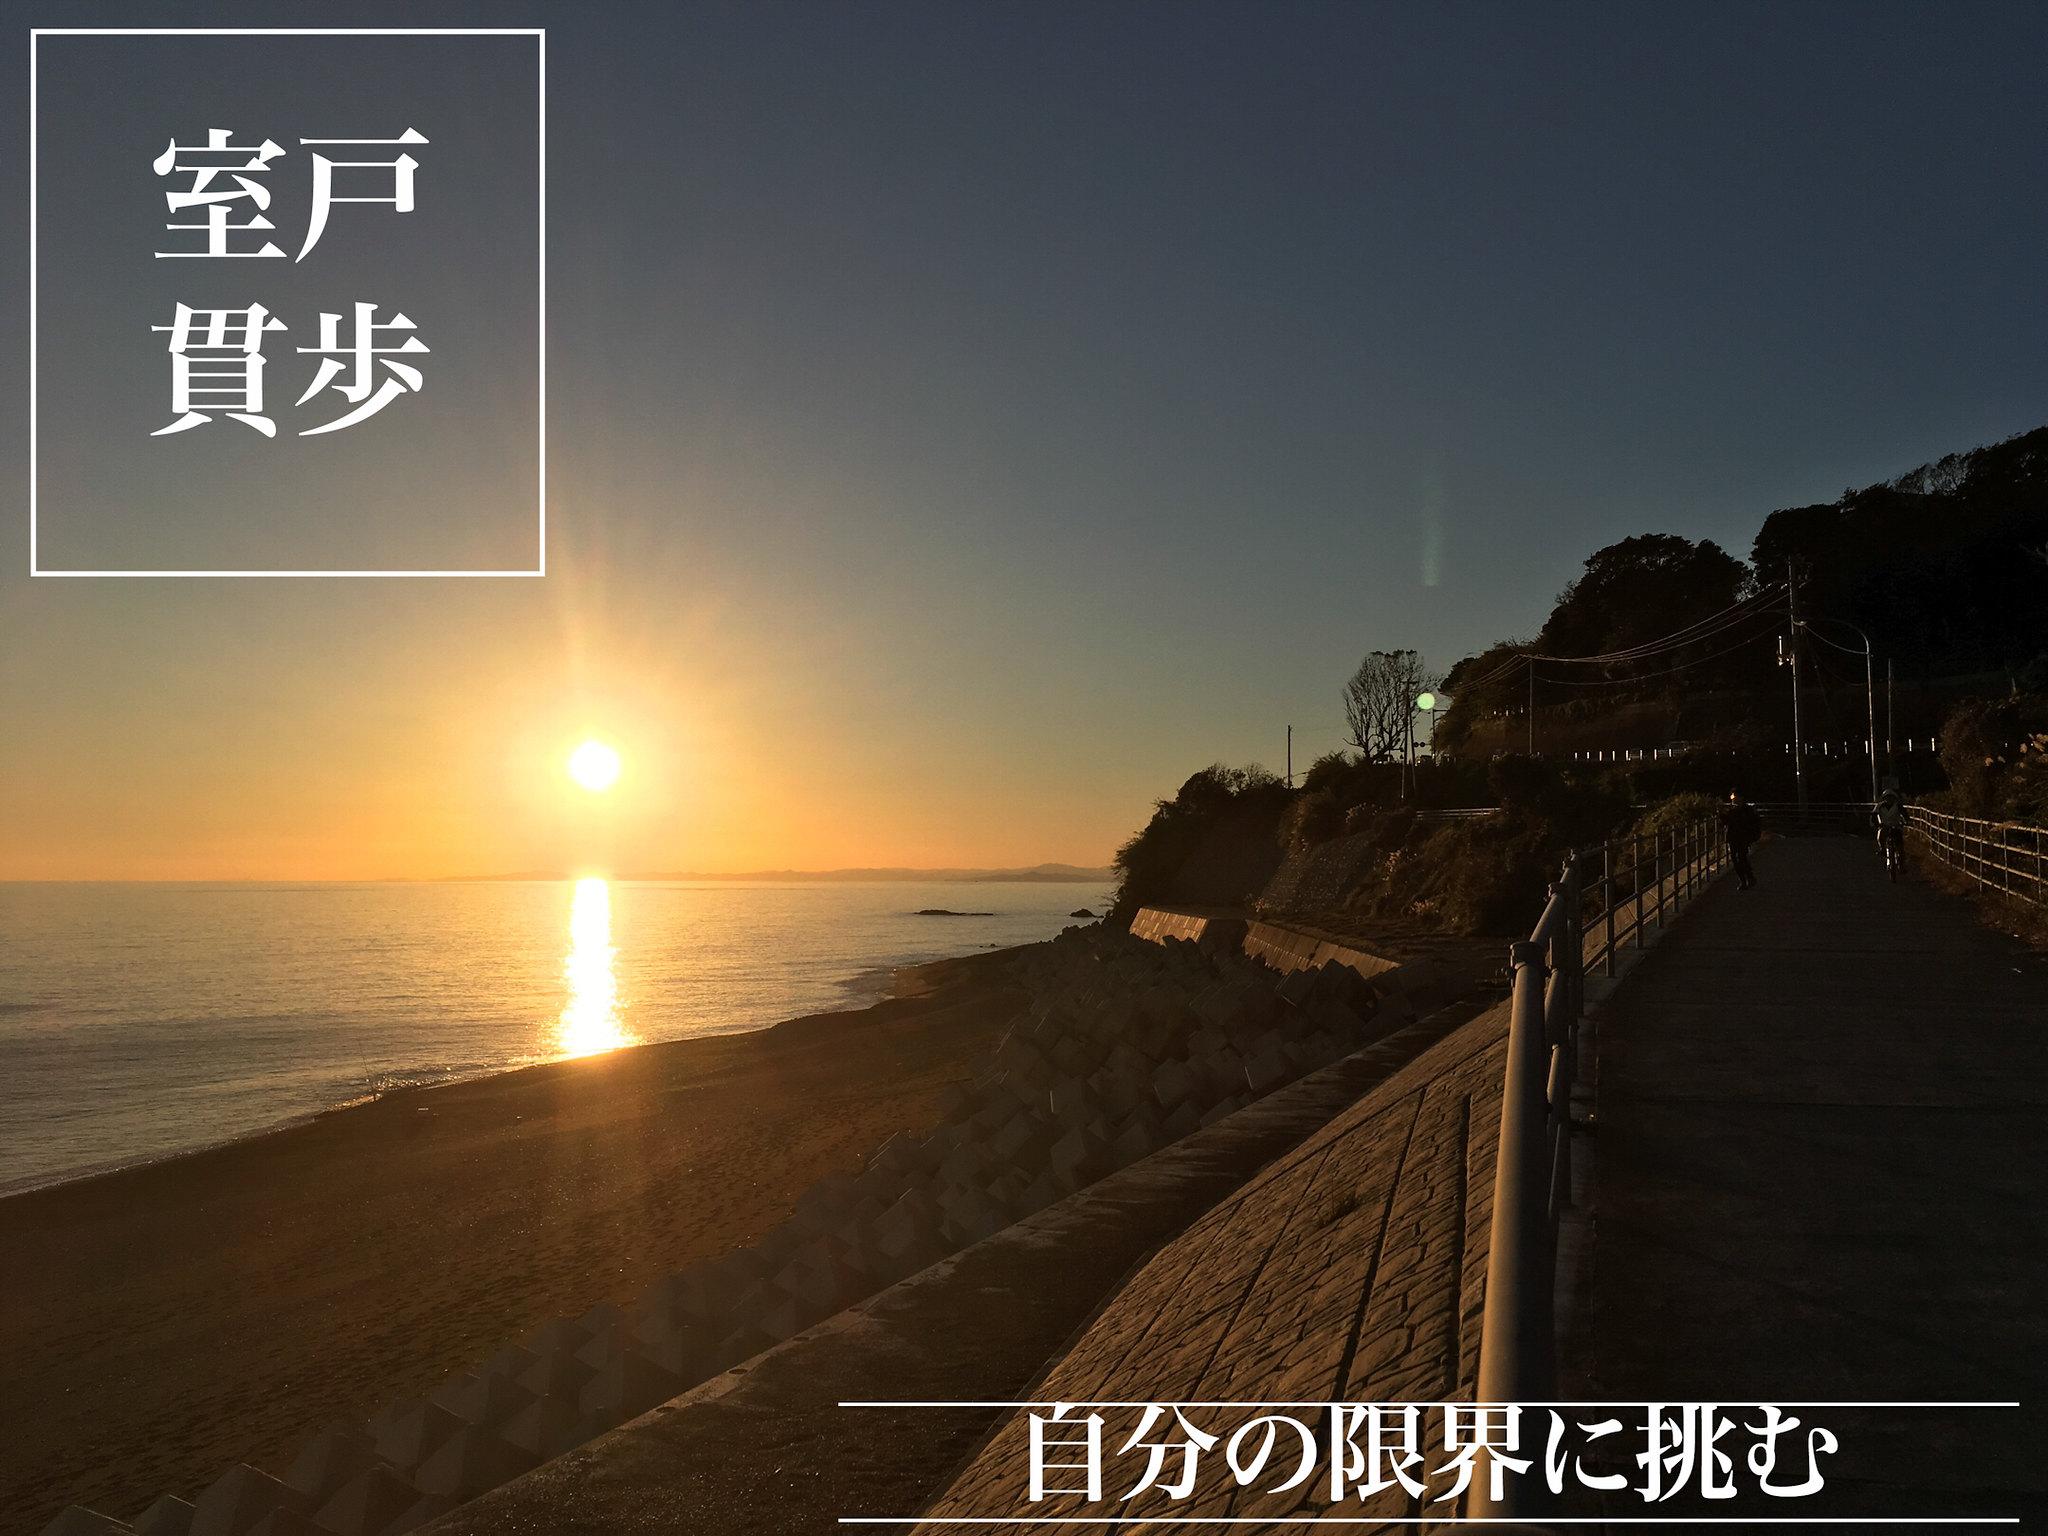 AdobePhotoshopExpress_2018_11_28_16:45:34